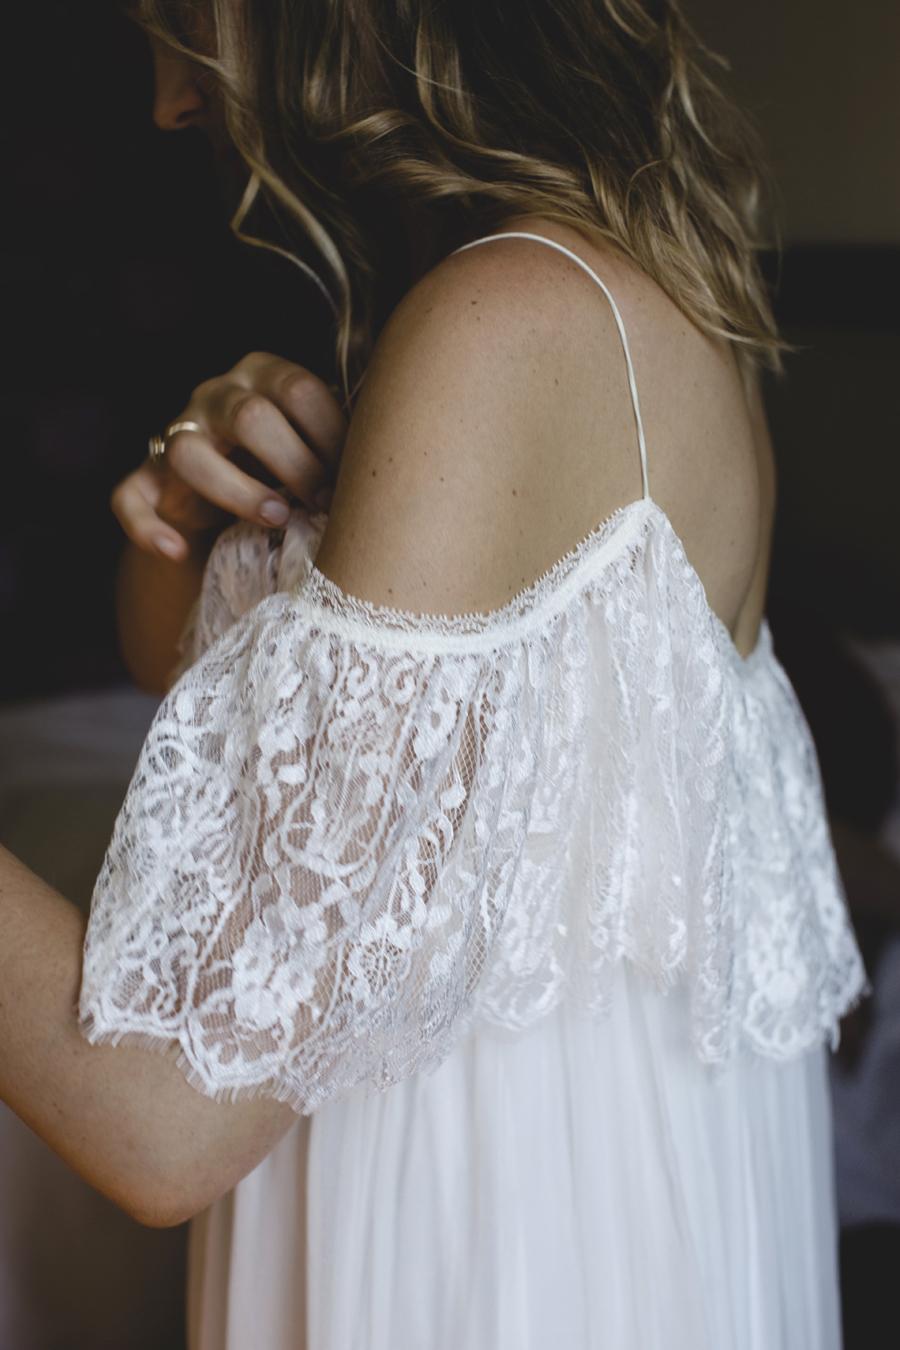 celine_marks_mariage_aurelie_keil_44